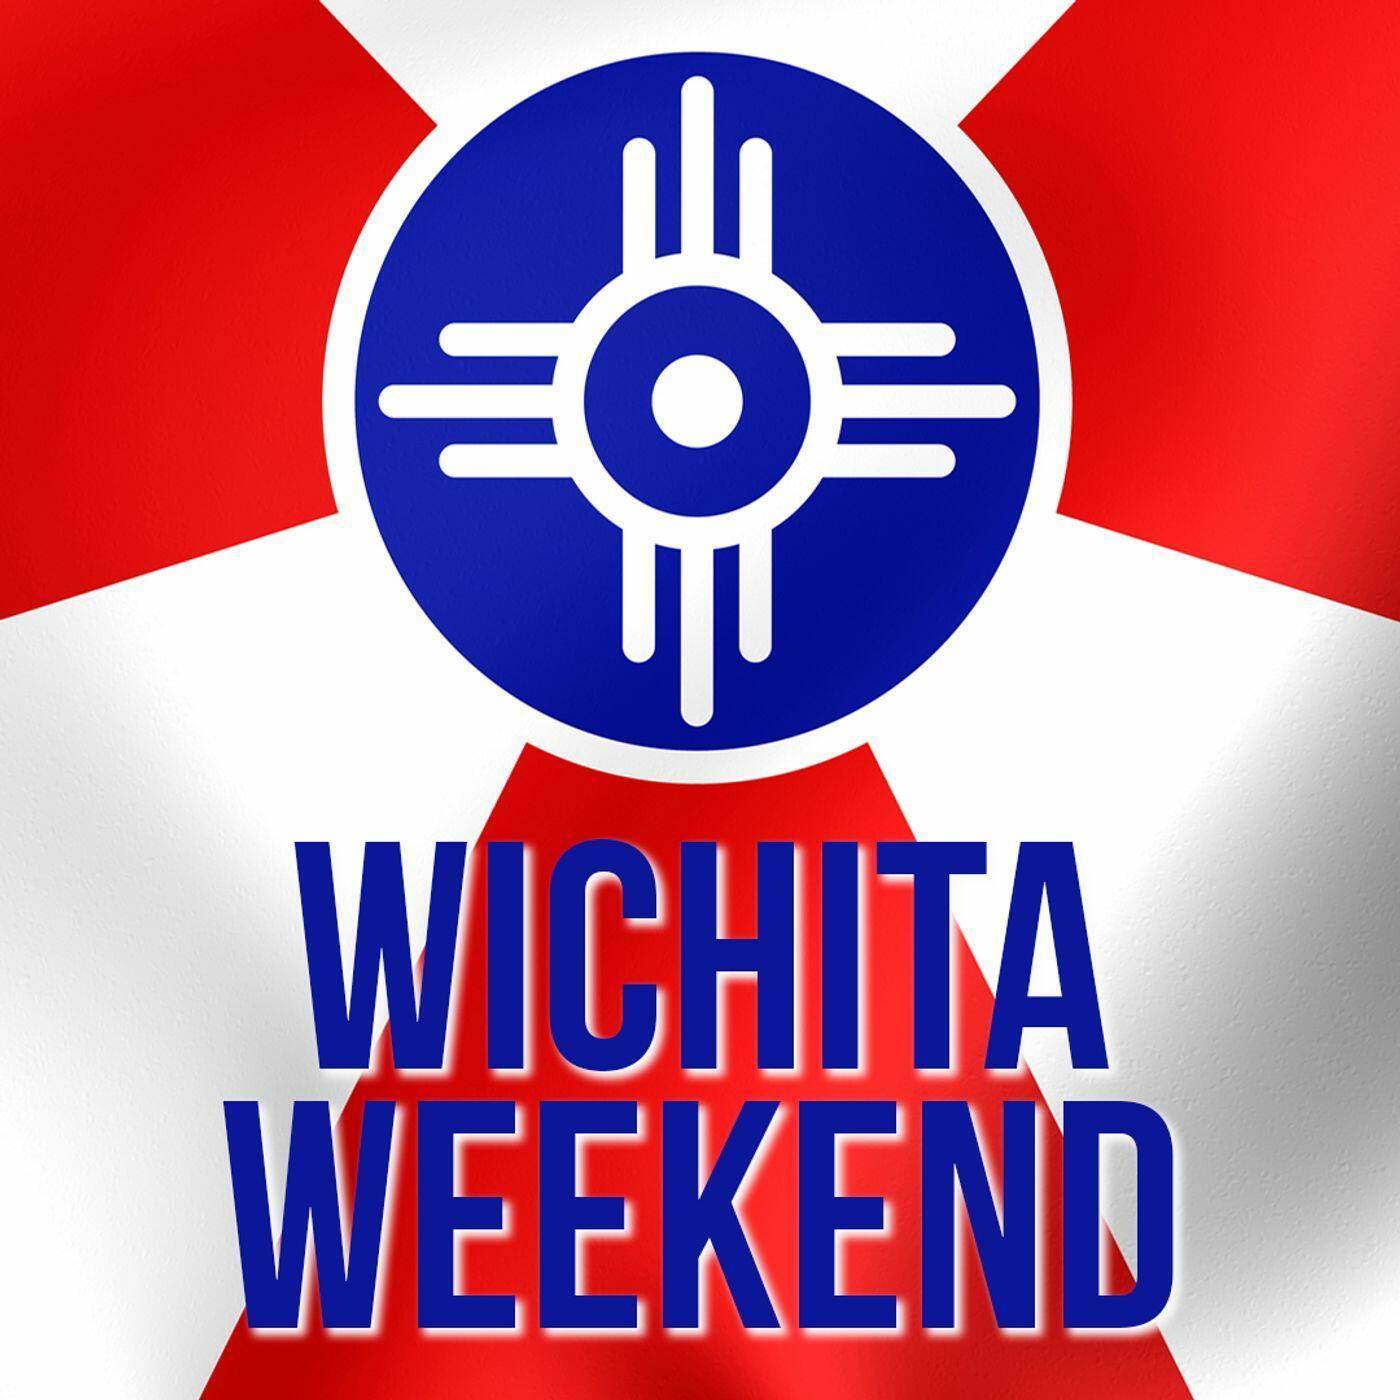 Wichita Weekend